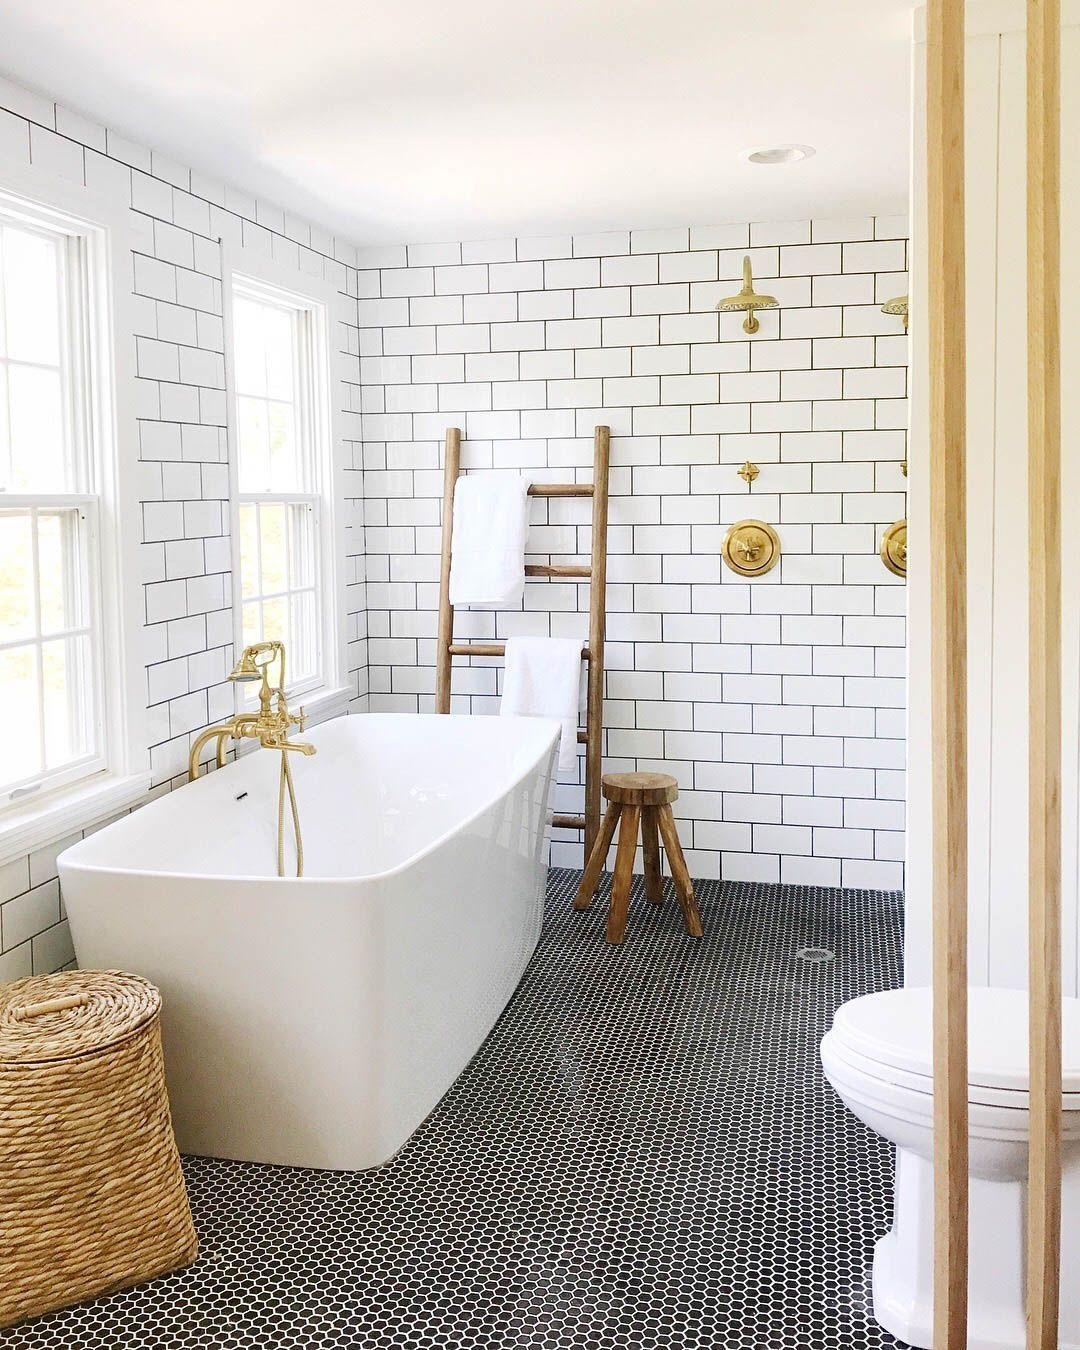 25 Amazing Subway Tile Bathroom Ideas Home Inspirations White Subway Tile Bathroom Penny Tiles Bathroom Bathroom Tile Designs